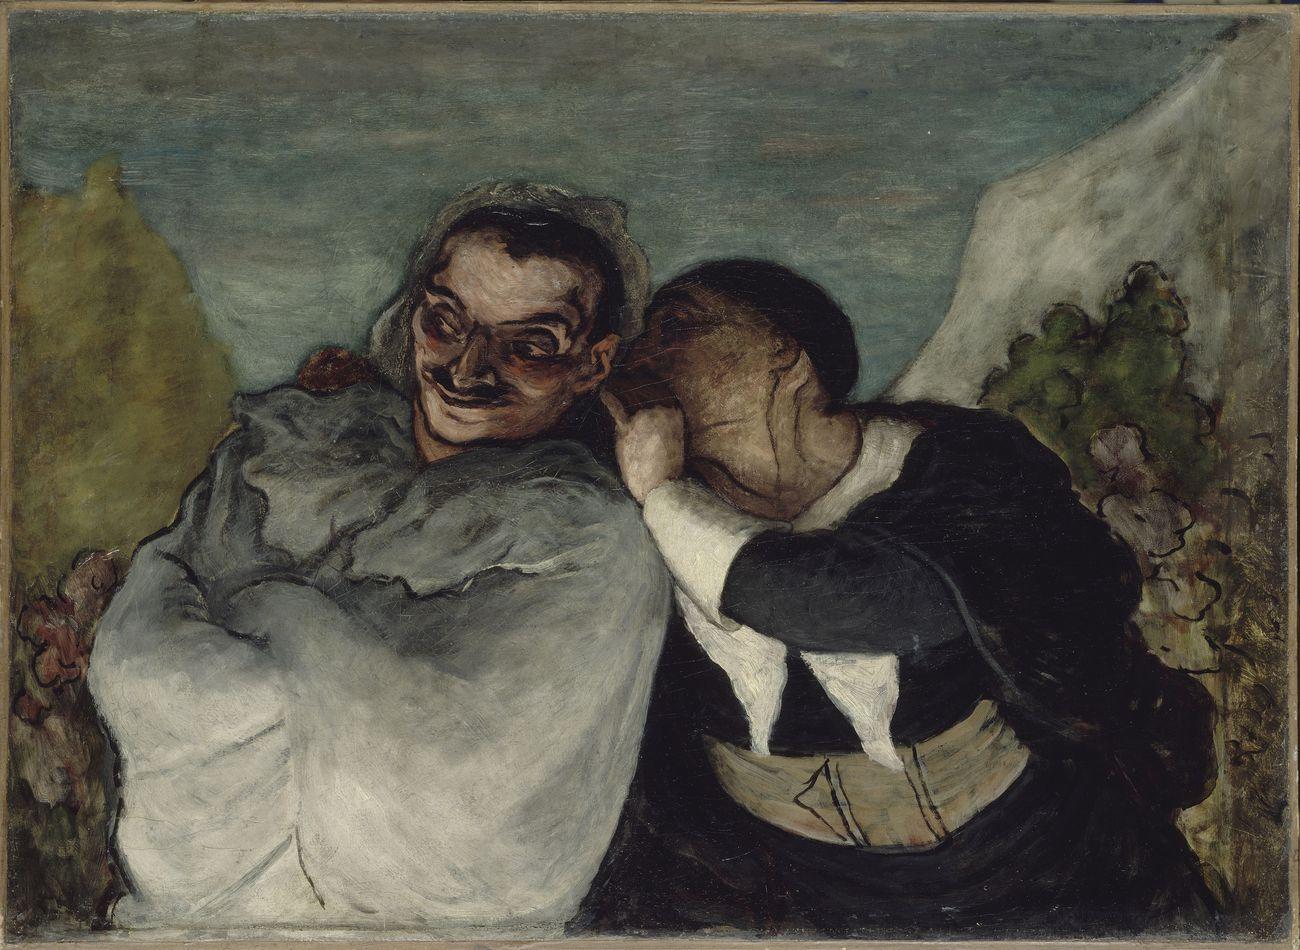 Honoré Daumier, Crispin et Scapin, 1864 ca.